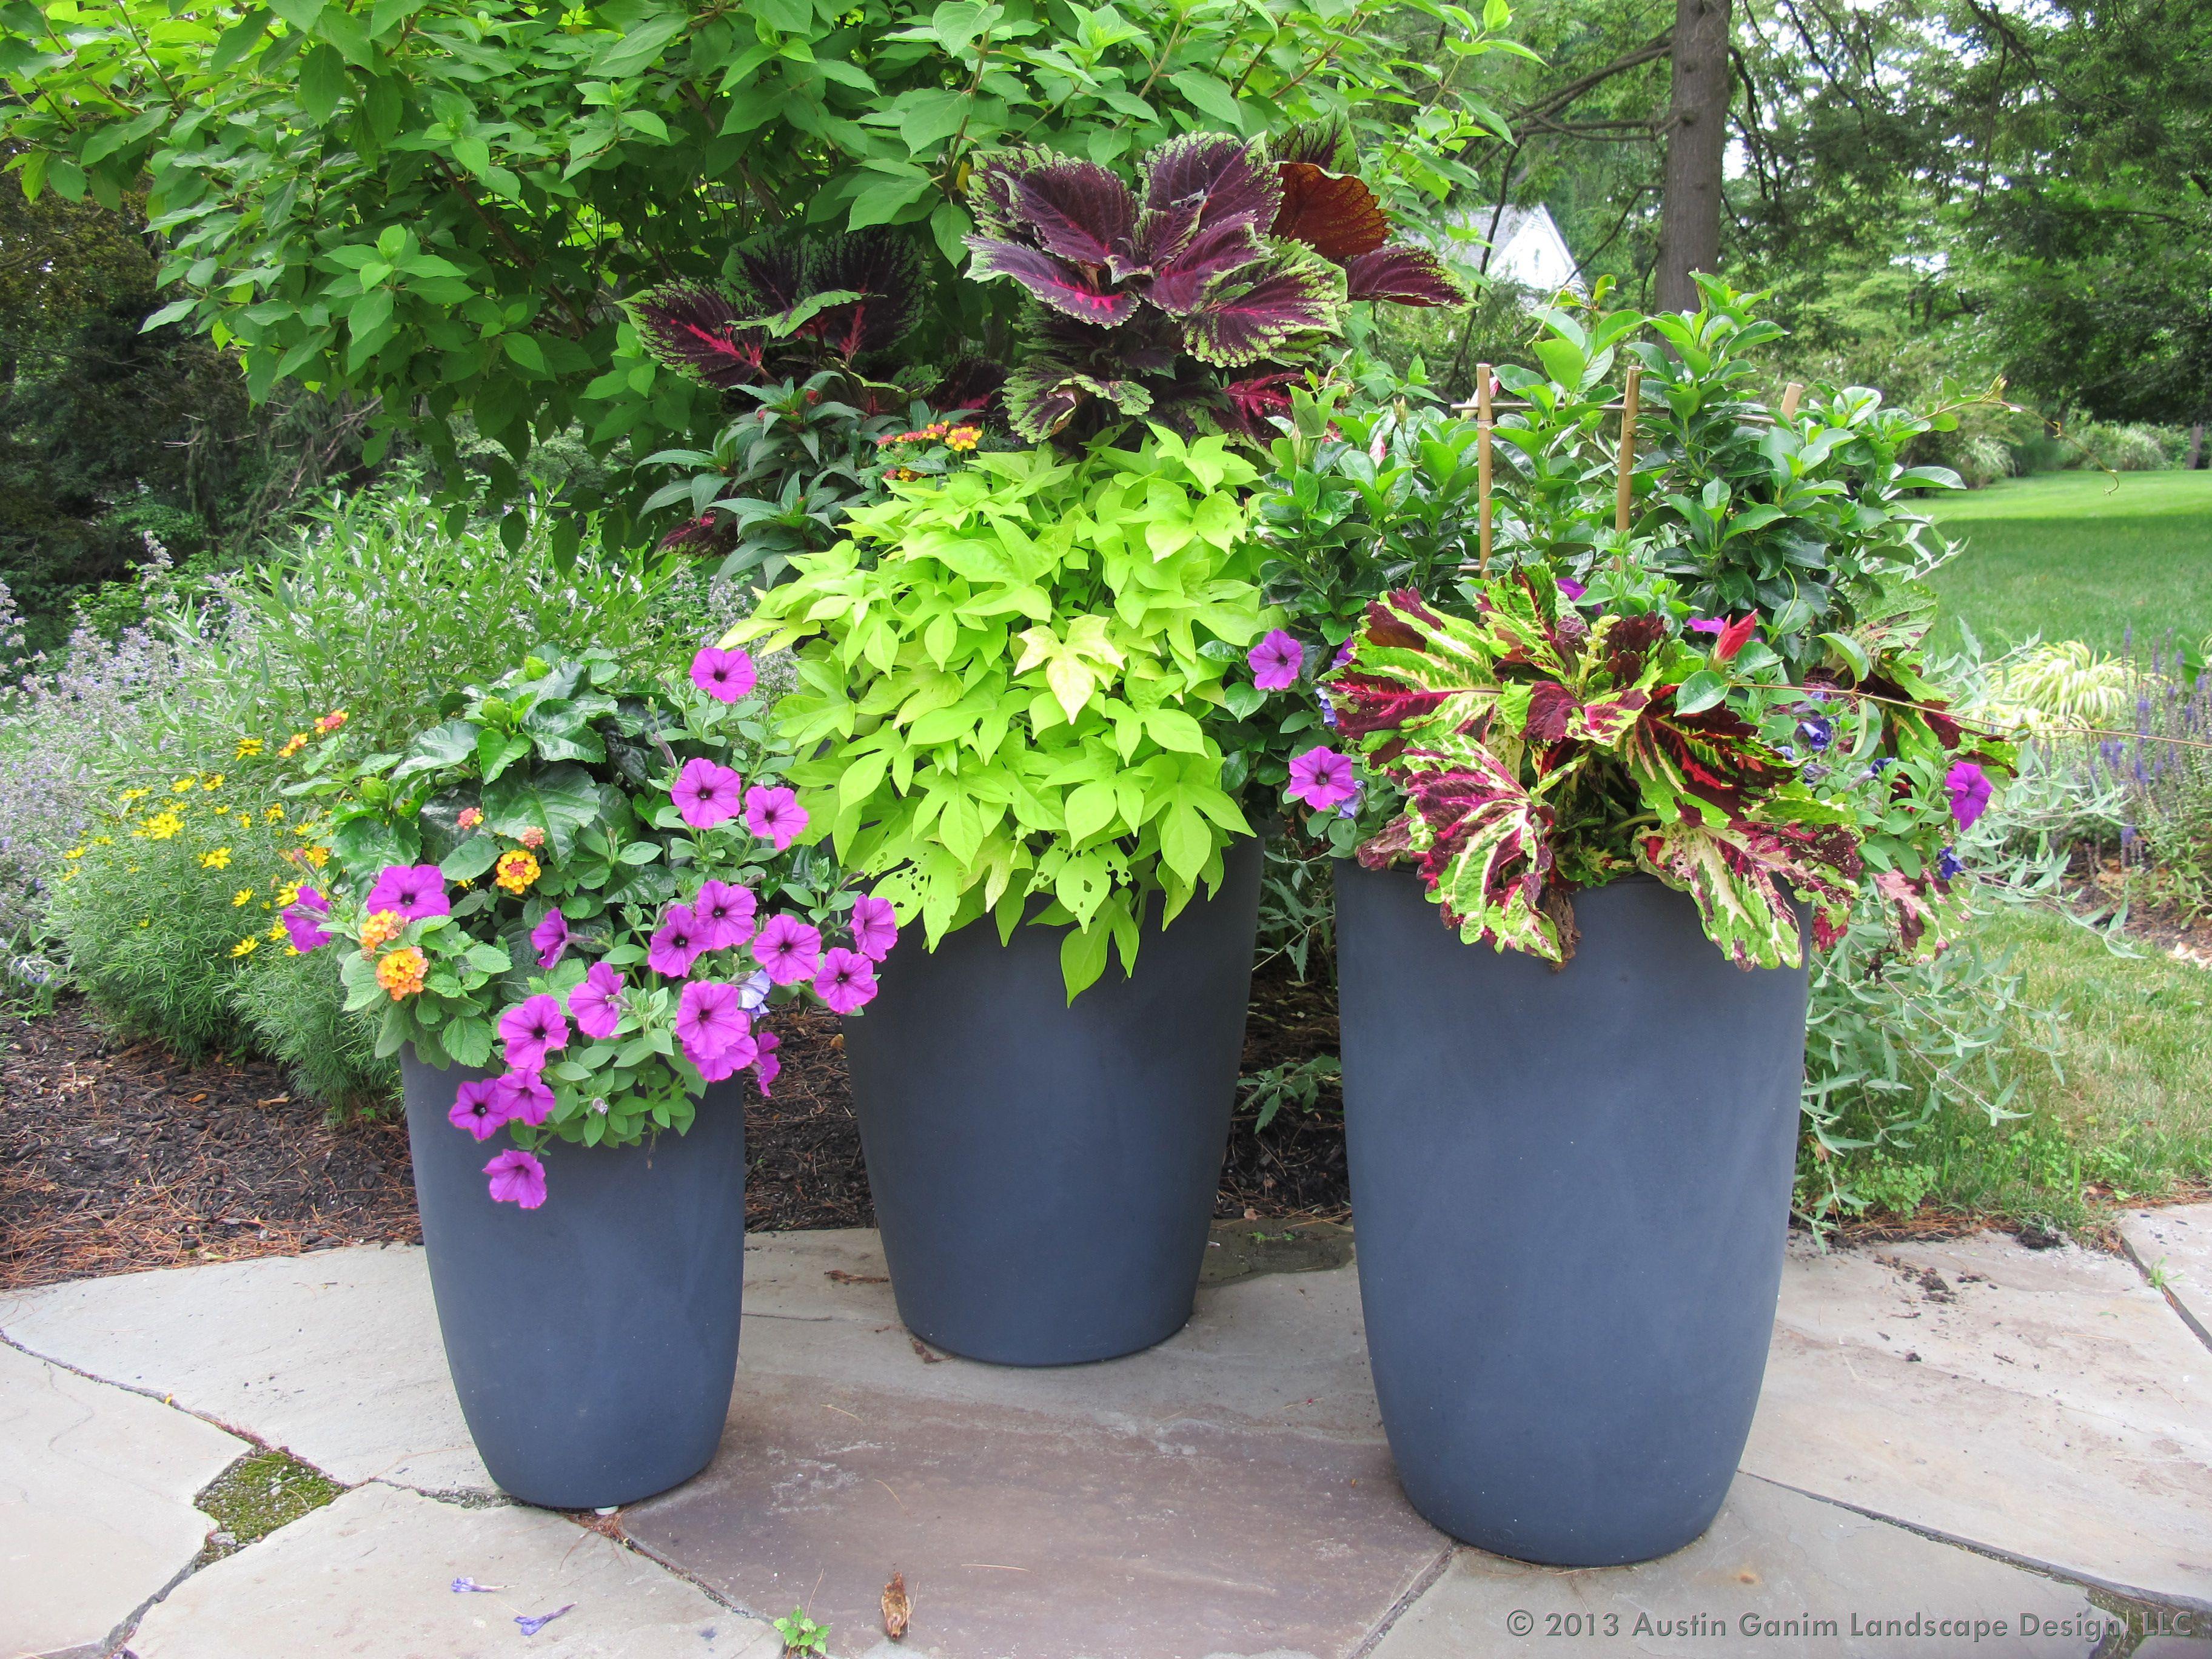 Austin Ganim Landscape Design, LLC This grouping of cylinder ...